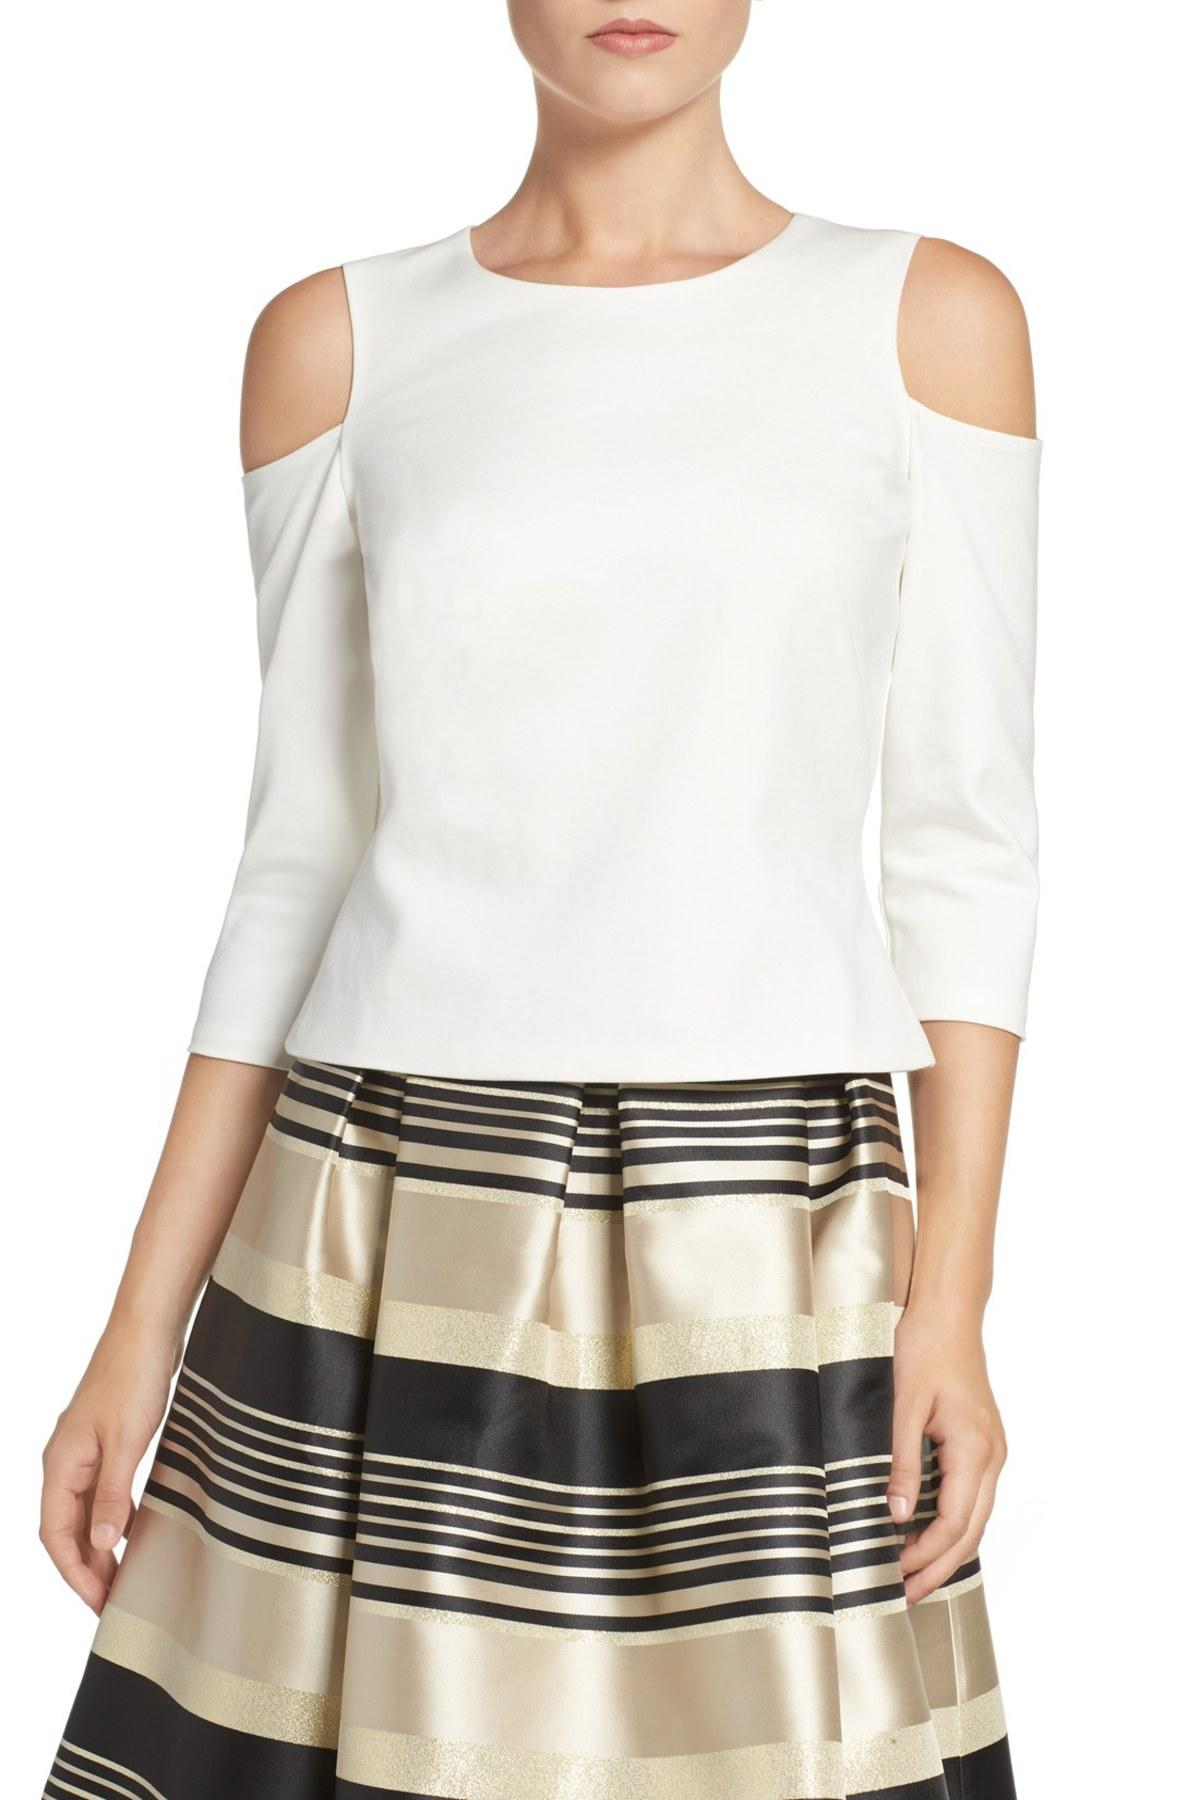 d833a2e6fb8a51 Lyst - Eliza J Cold Shoulder Top in White